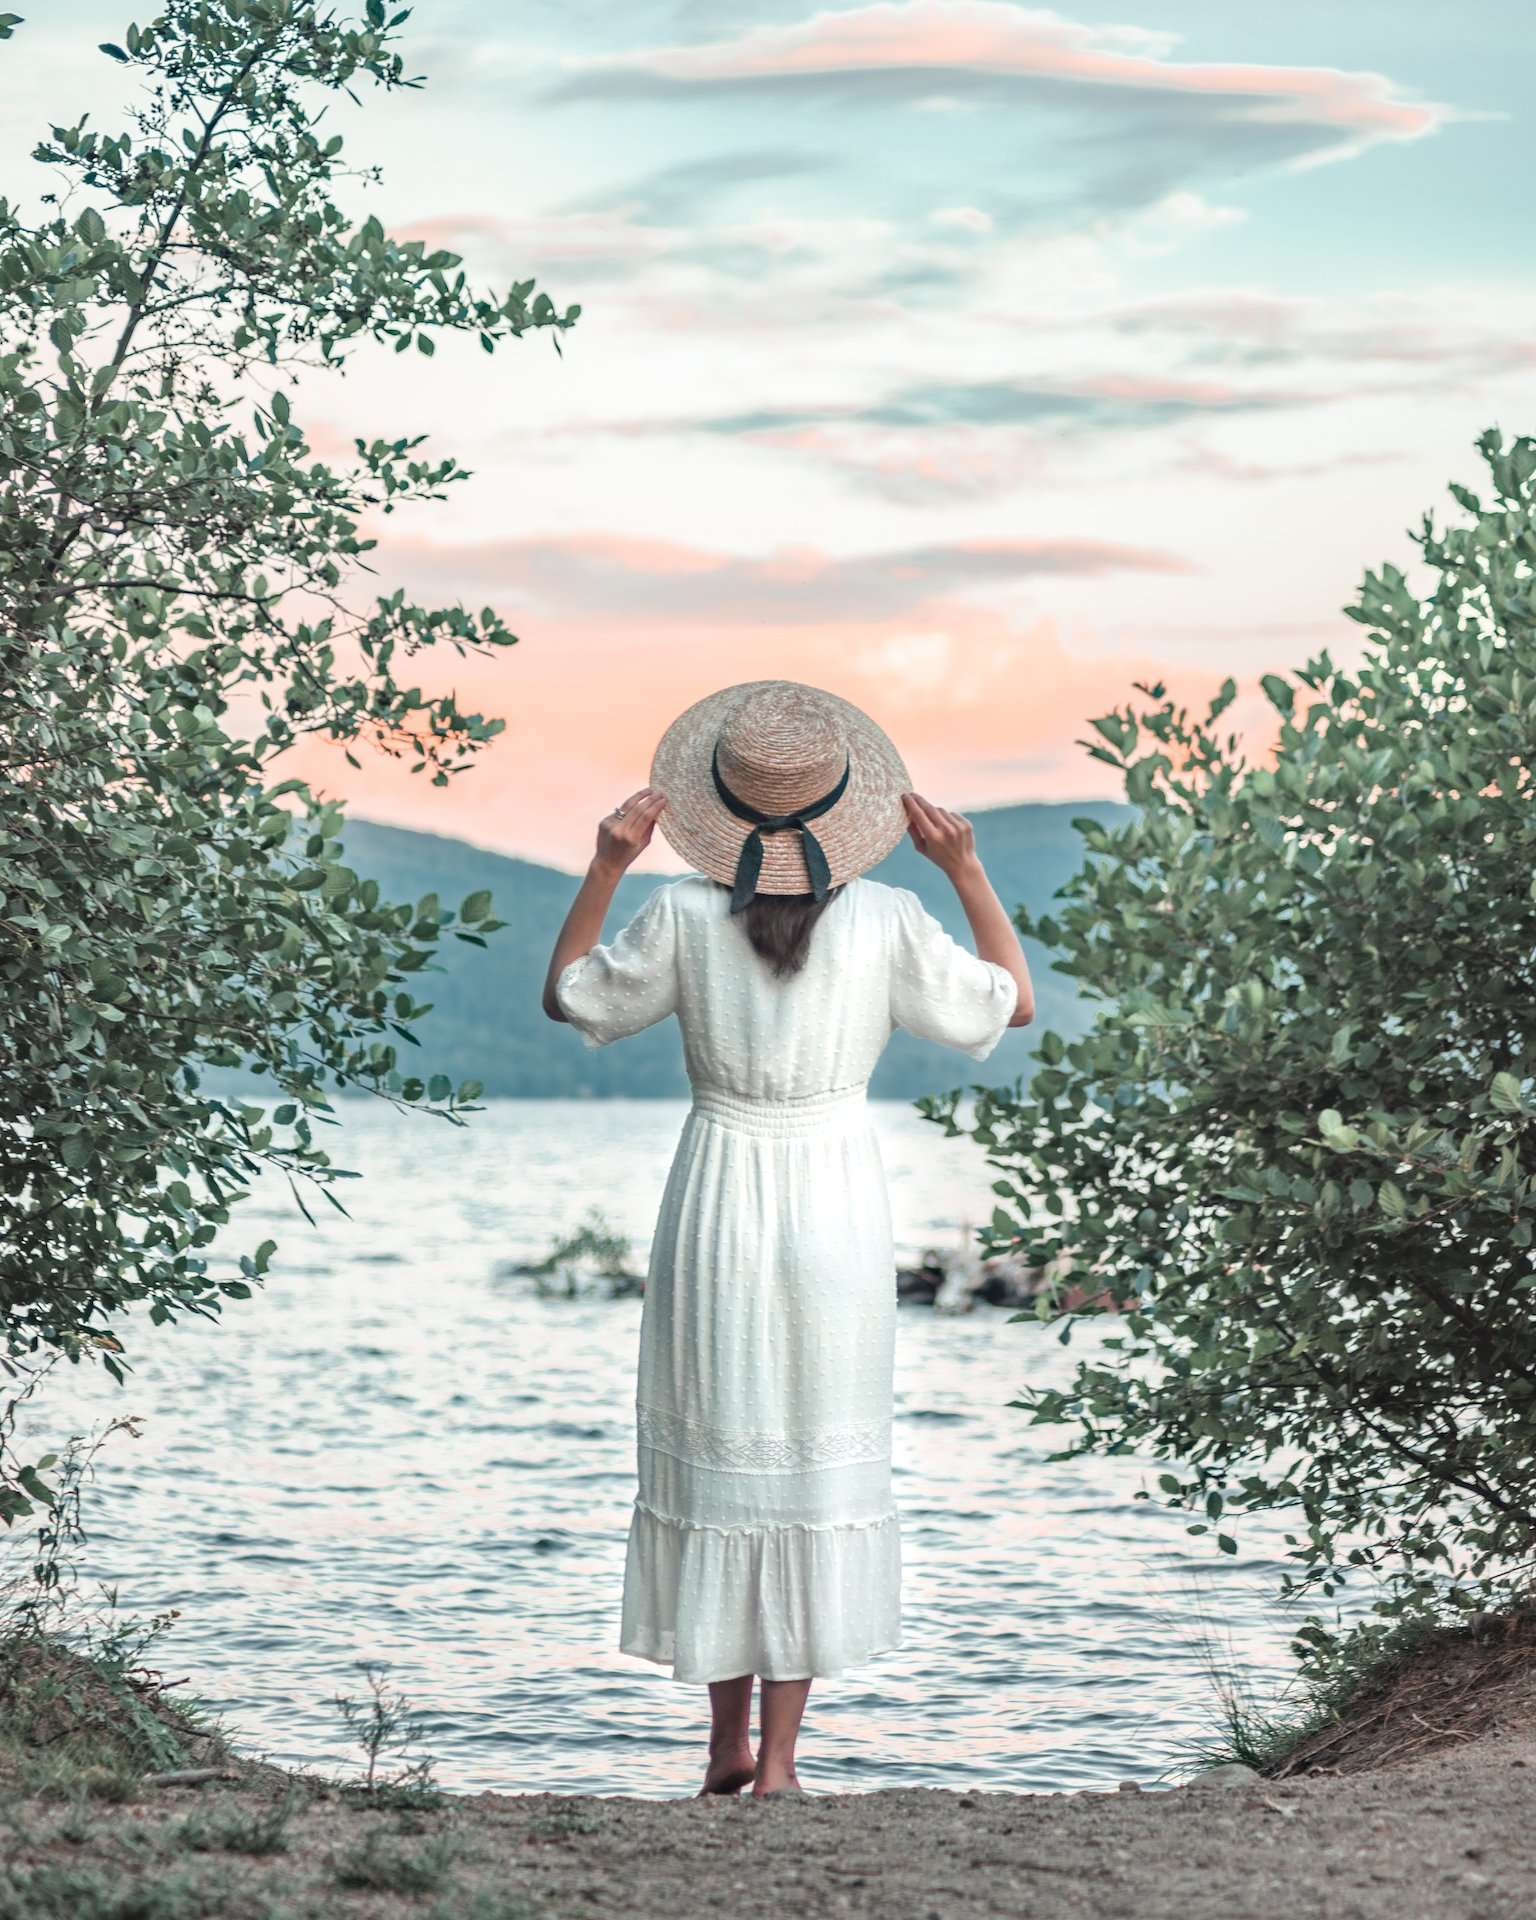 woman wearing sunhat and watching sunset